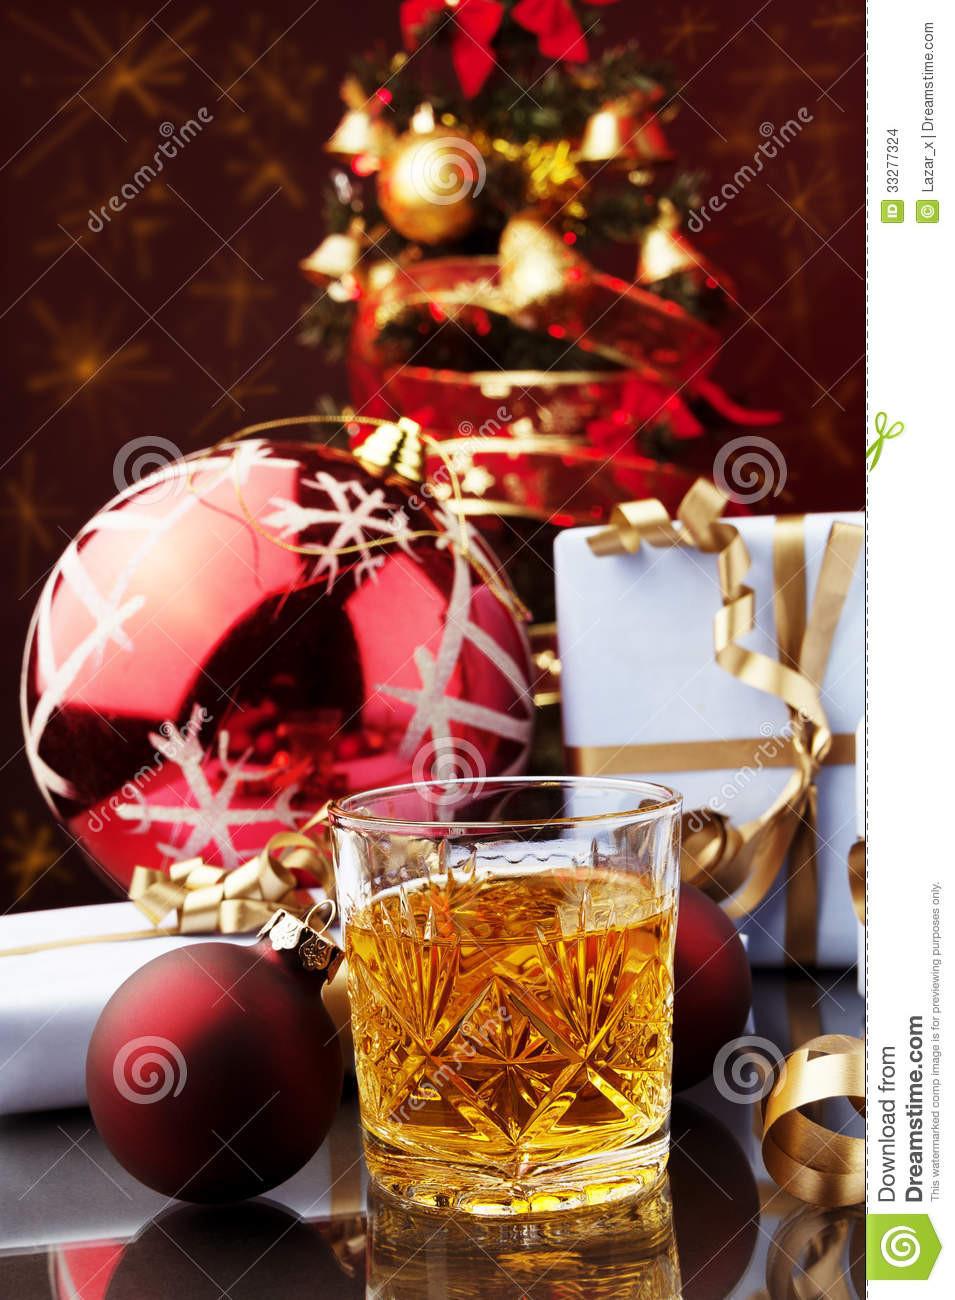 Whiskey Christmas Drinks  Stock Christmas time and glass of whiskey Image